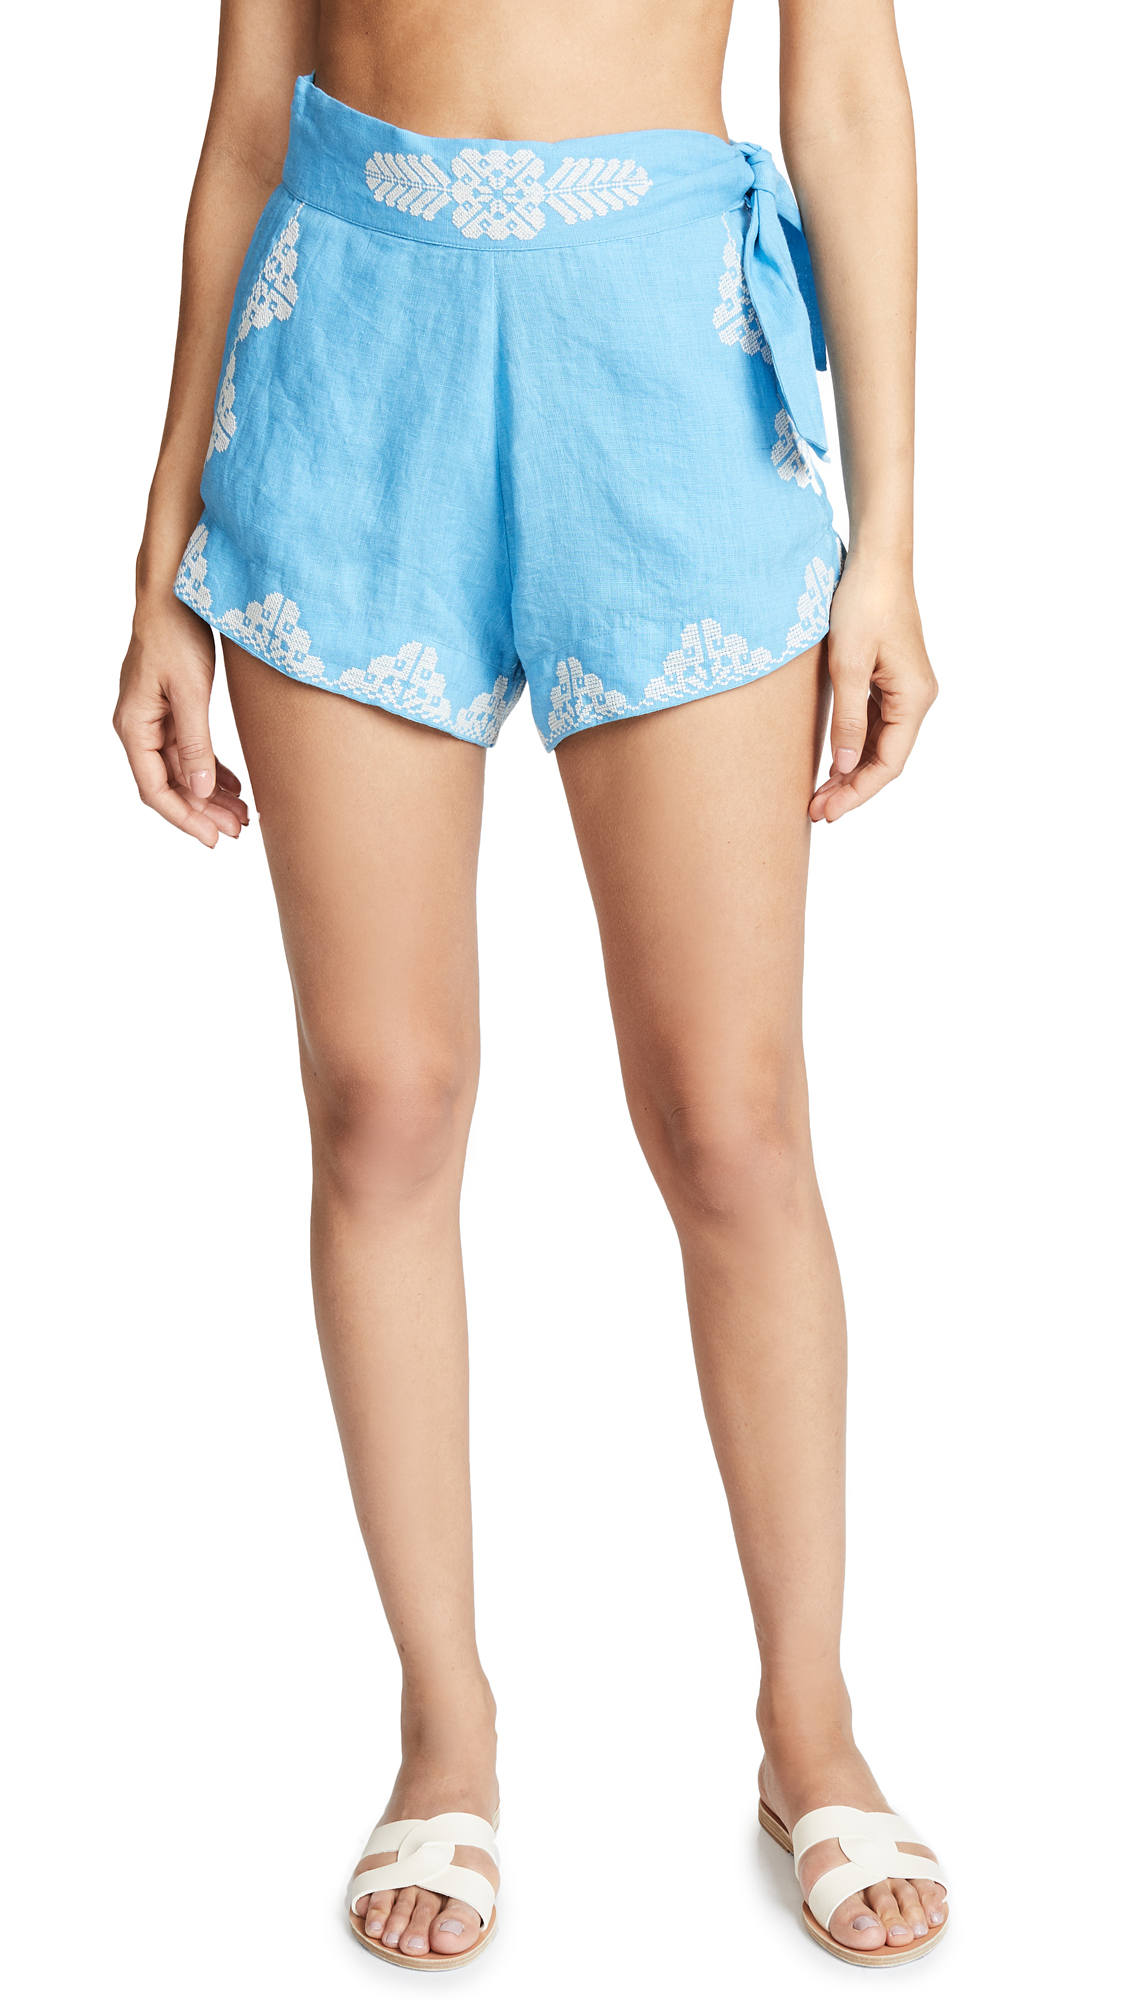 CAROLINA K Sandra Shorts in Blue/Off White